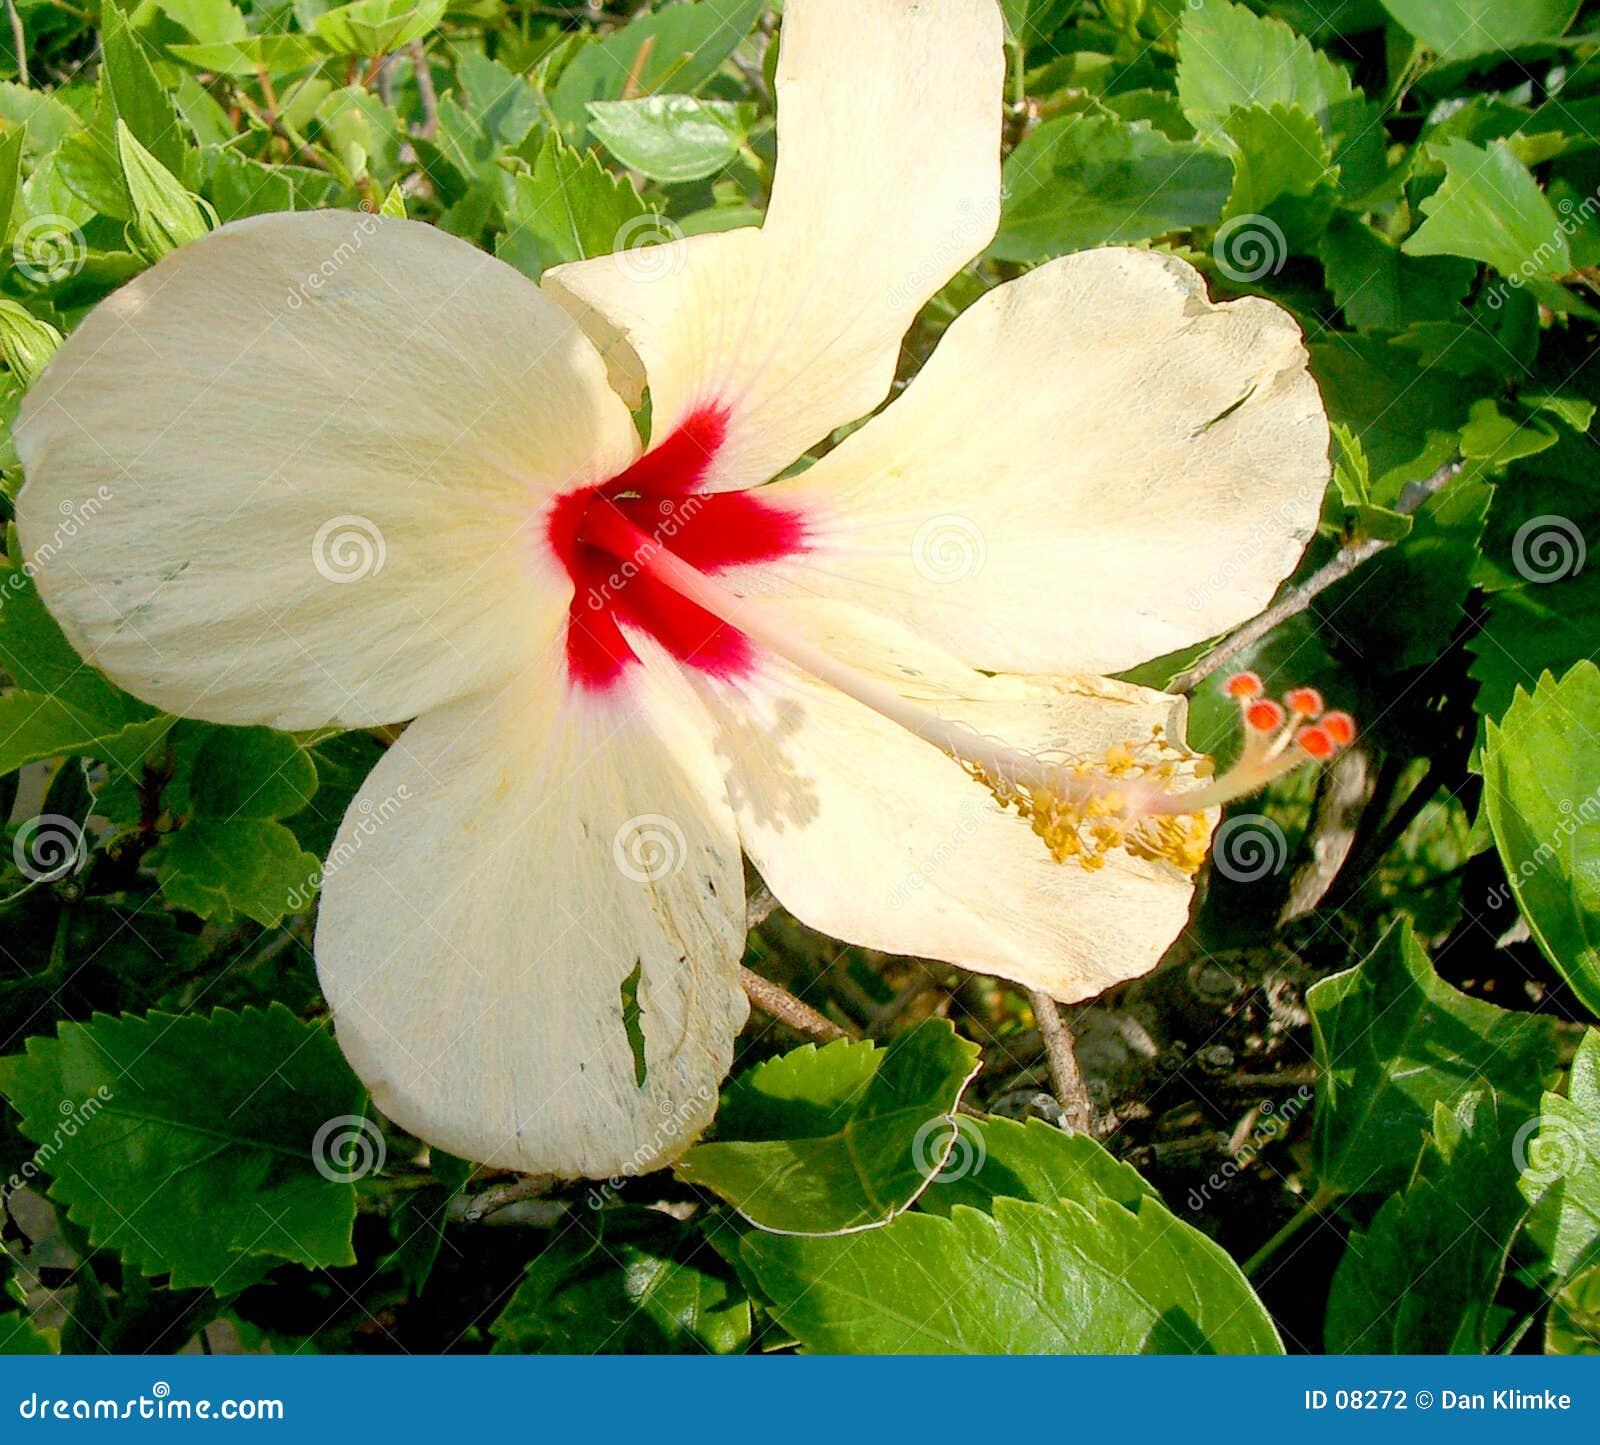 Cancun Lily